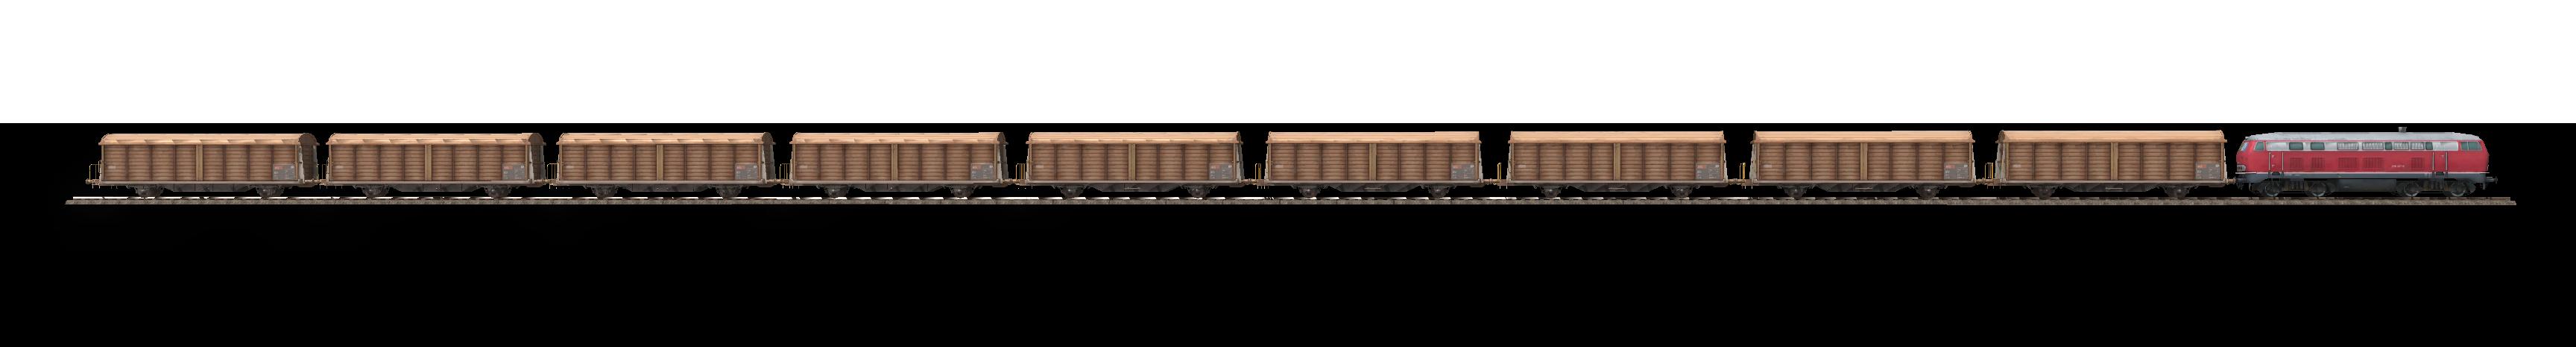 Concept Art Train Fever